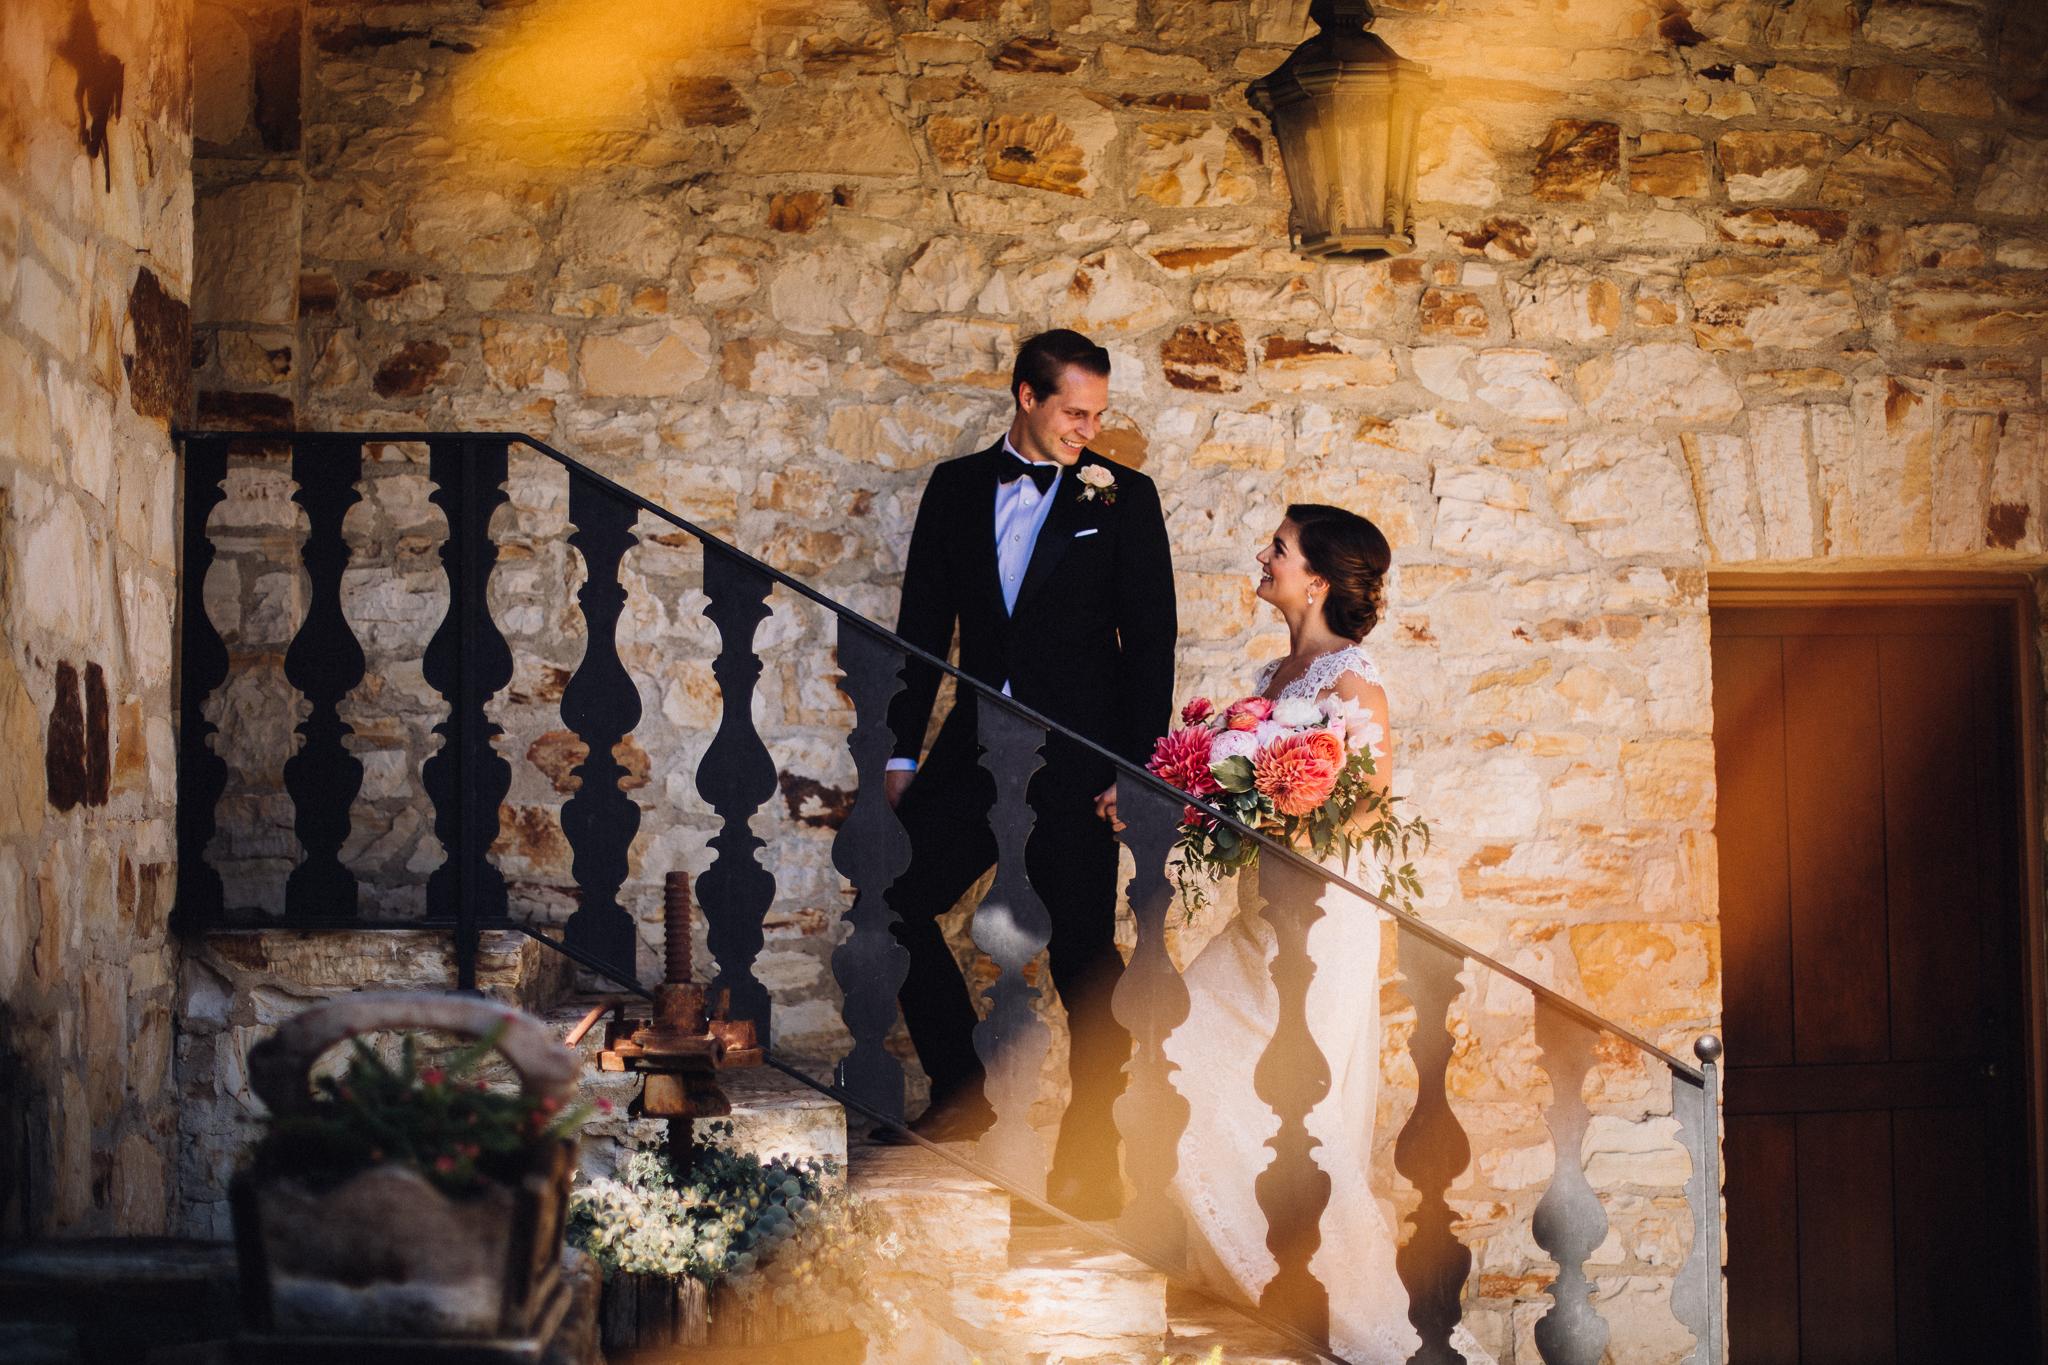 Archer Inspired Photography Carmel California Wedding Lifestyle Documentary Photographer Bride and Groom-7.jpg